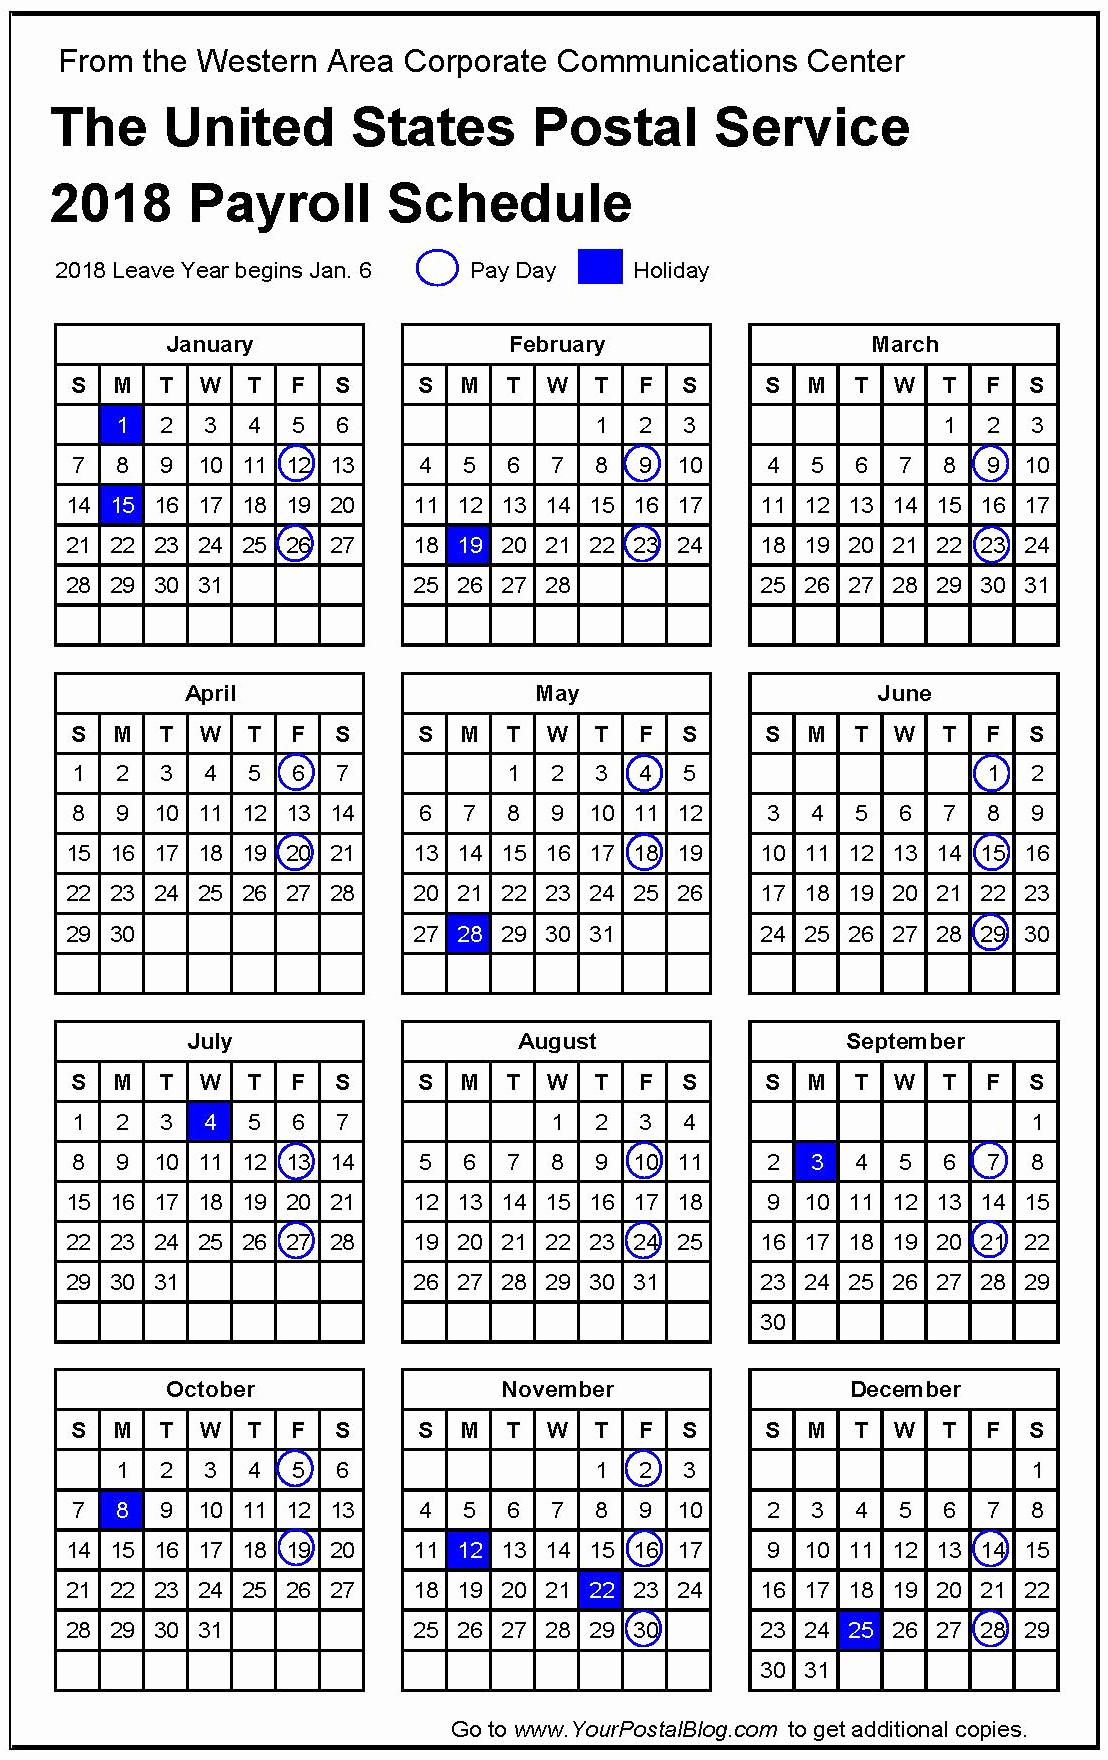 2019 Biweekly Payroll Calendar Template Awesome 2018 Postal Payroll Calendar